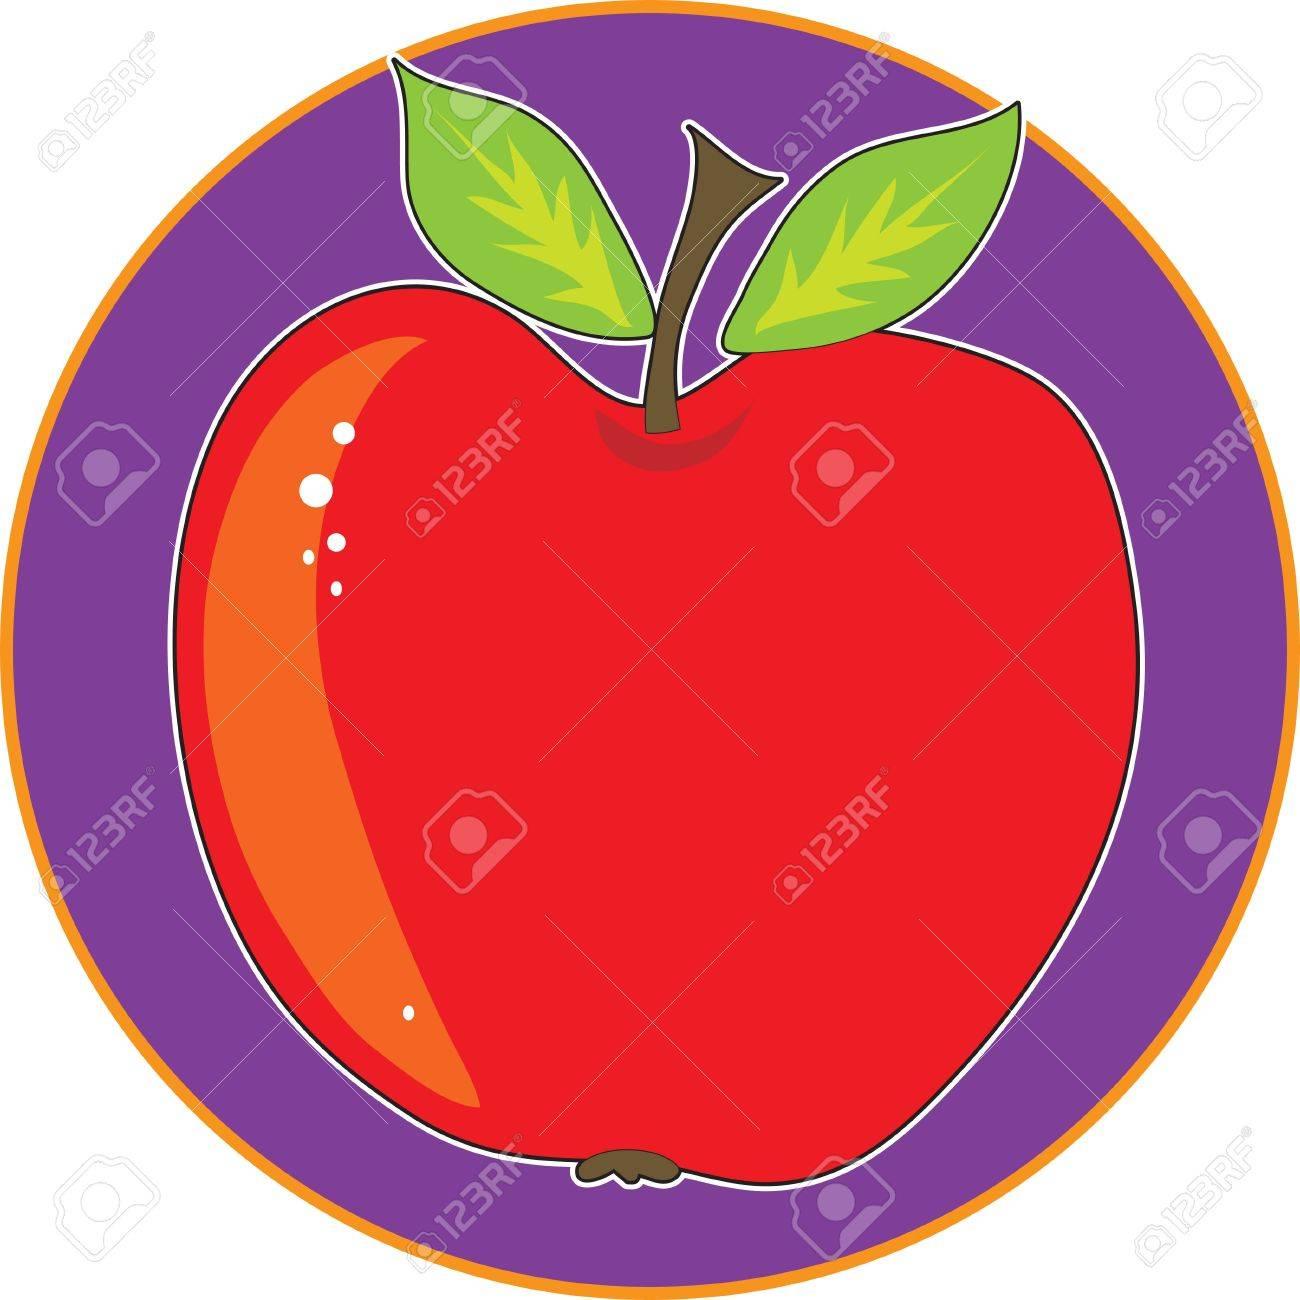 purple apple clipart. a single apple on bright purple circle background stock vector - 9721261 clipart